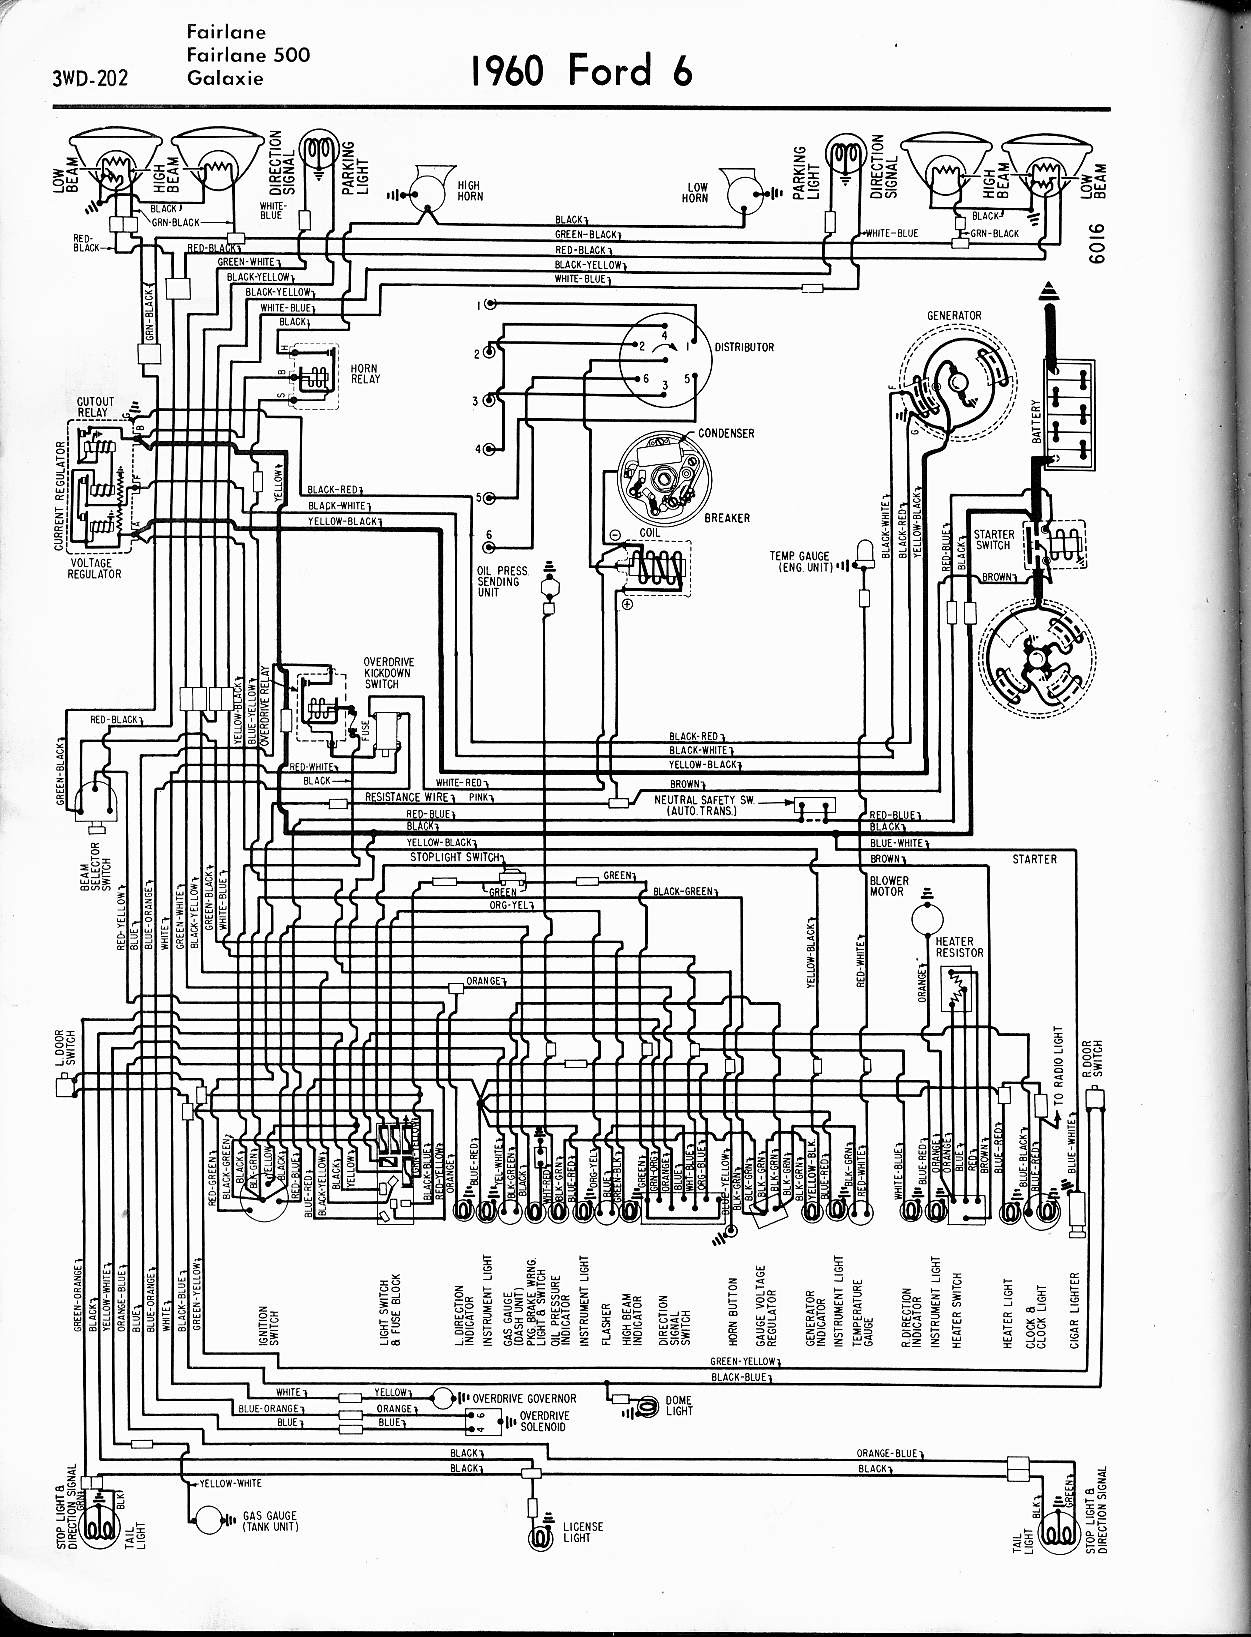 Diagram 1973 73 Ford Maverick Electrical Wiring Diagrams Manual Original Full Version Hd Quality Manual Original Diagramsrooks Fattoriagarbole It